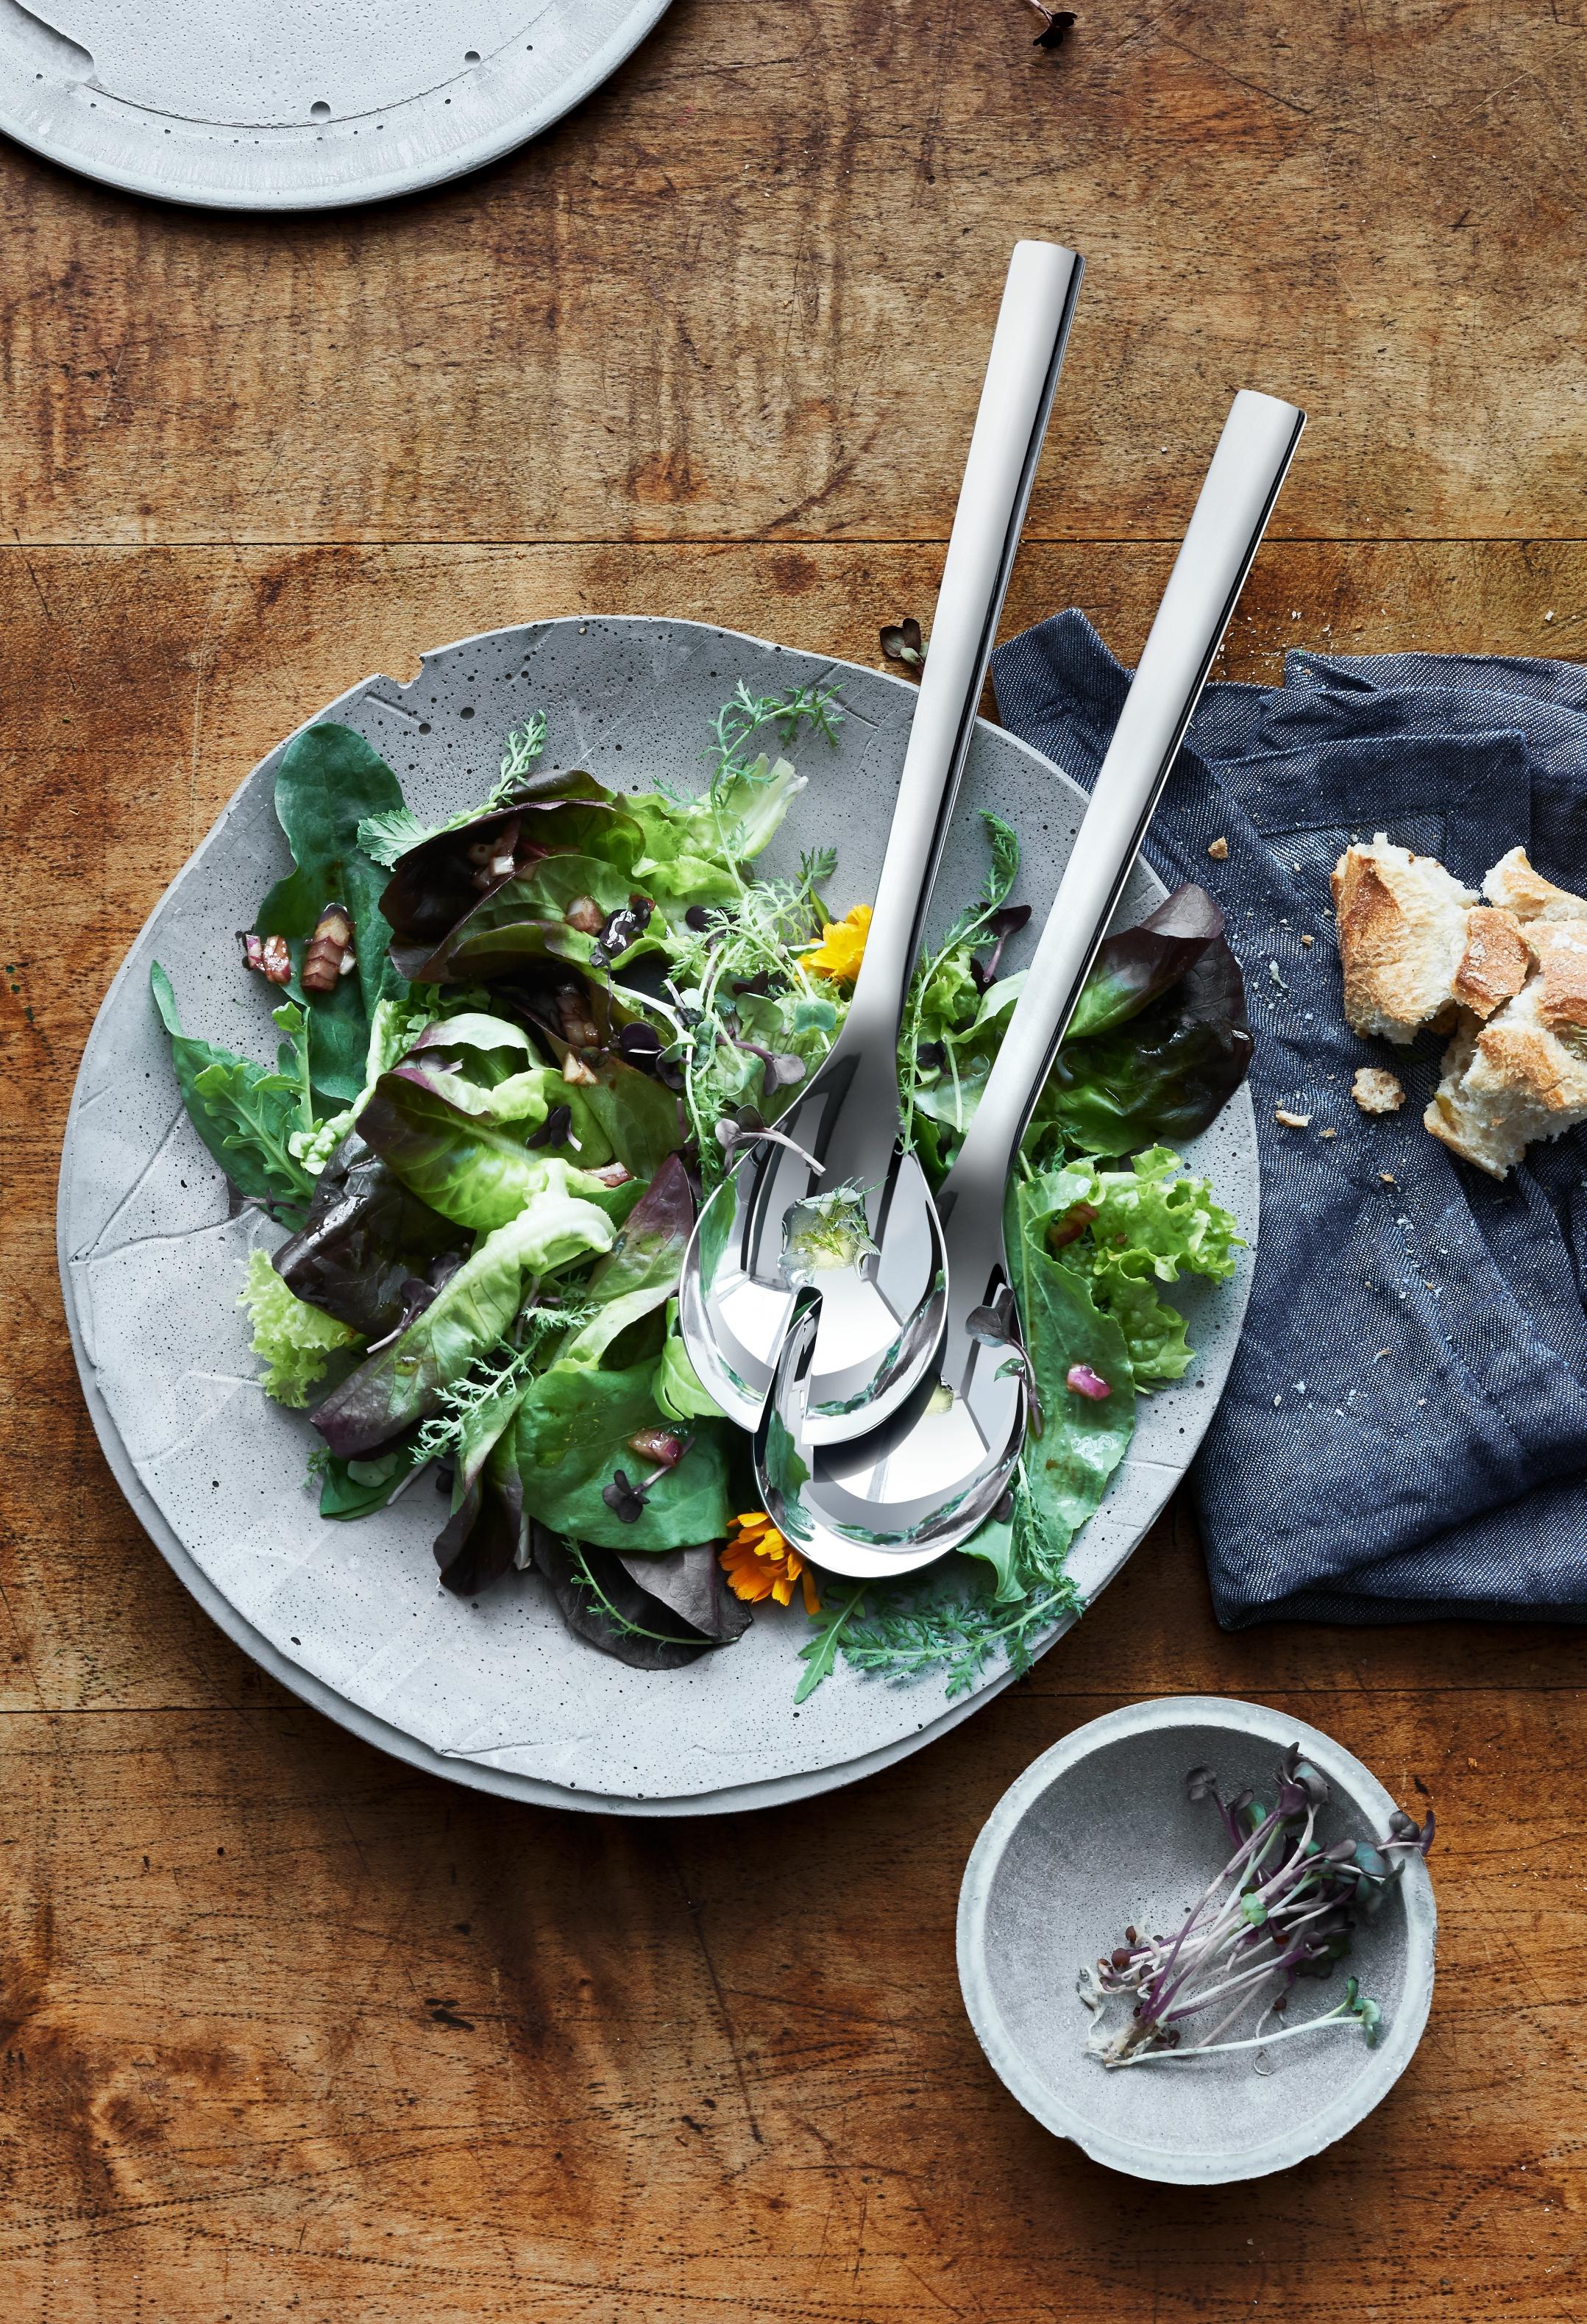 Nuova salata servis gereçleri: Her sofraya uygun